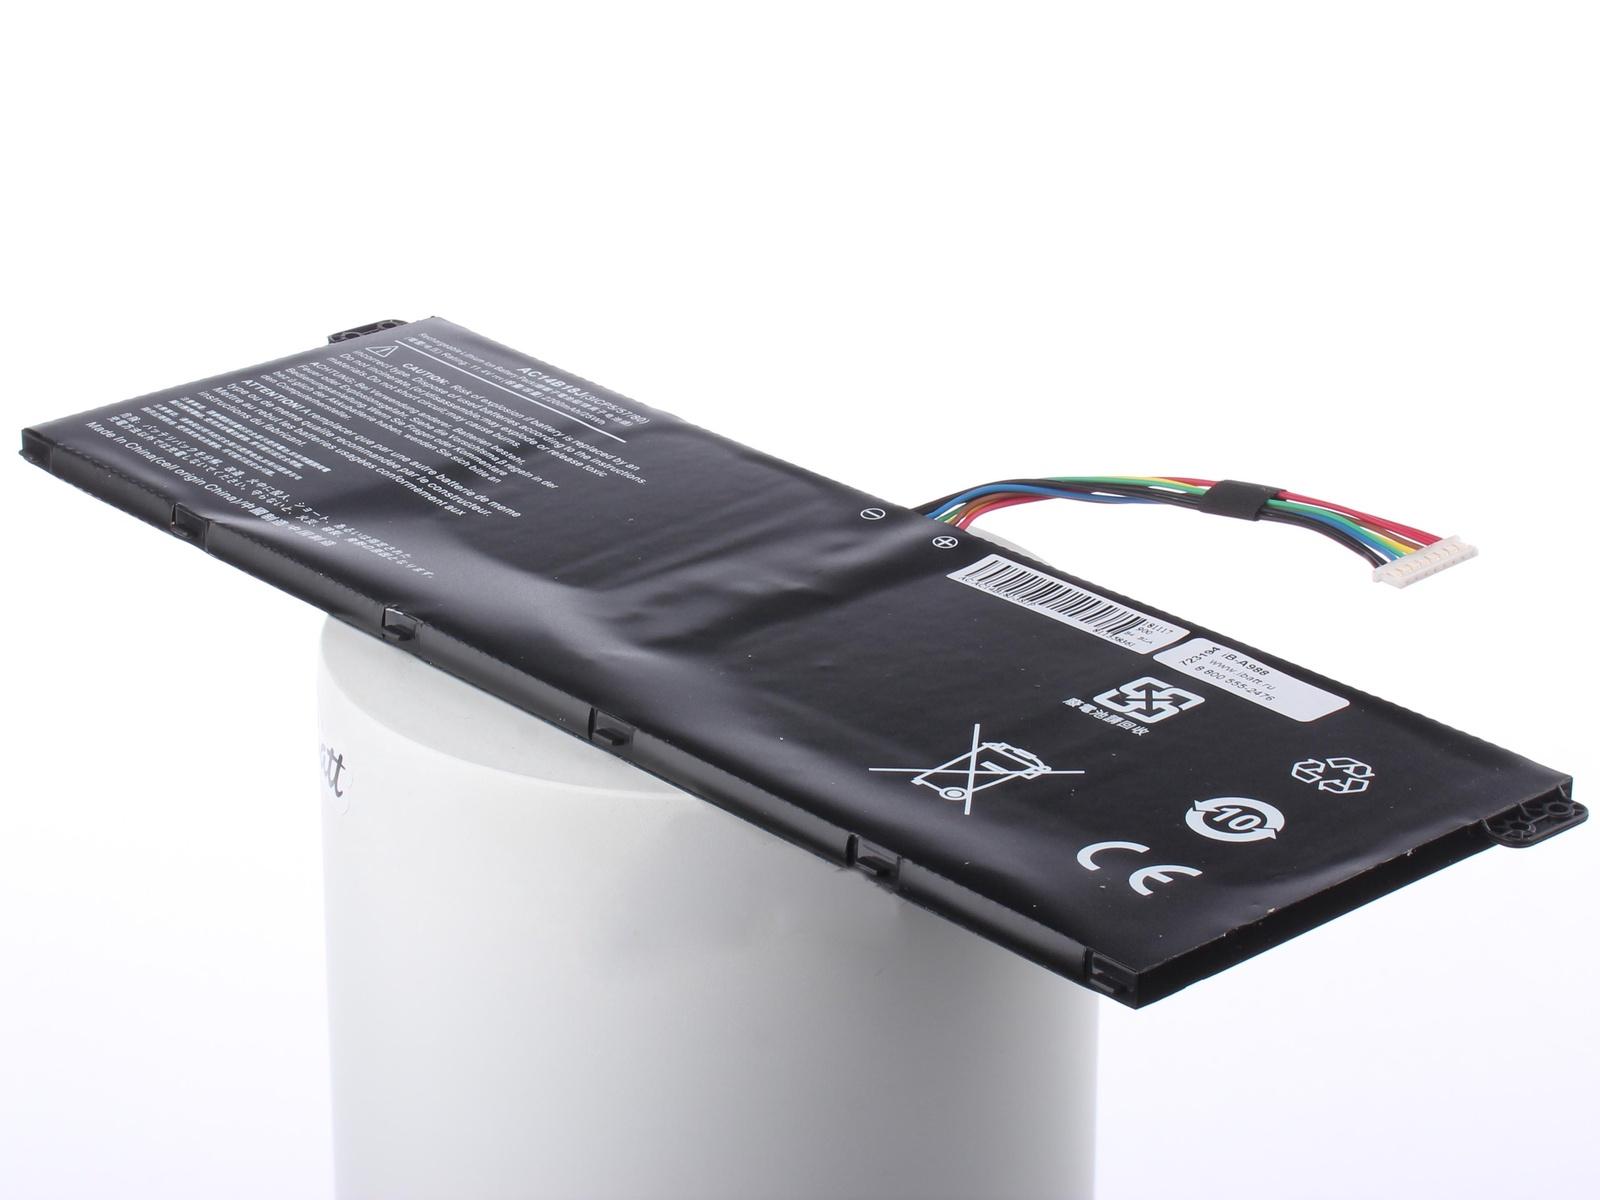 цены на Аккумуляторная батарея iBatt iB-T6-A988 3220mAh для ноутбуков Acer Aspire ES1-521-67AT, ASPIRE ES1-731-C27P, ASPIRE ES1-731G-P76Q, Aspire ES1-131-C4QQ, Aspire ES1-131-C9L8, ASPIRE ES1-731G-P15K, Aspire ES1-731G-P4RL, Aspire ES1-331-C0TP,  в интернет-магазинах